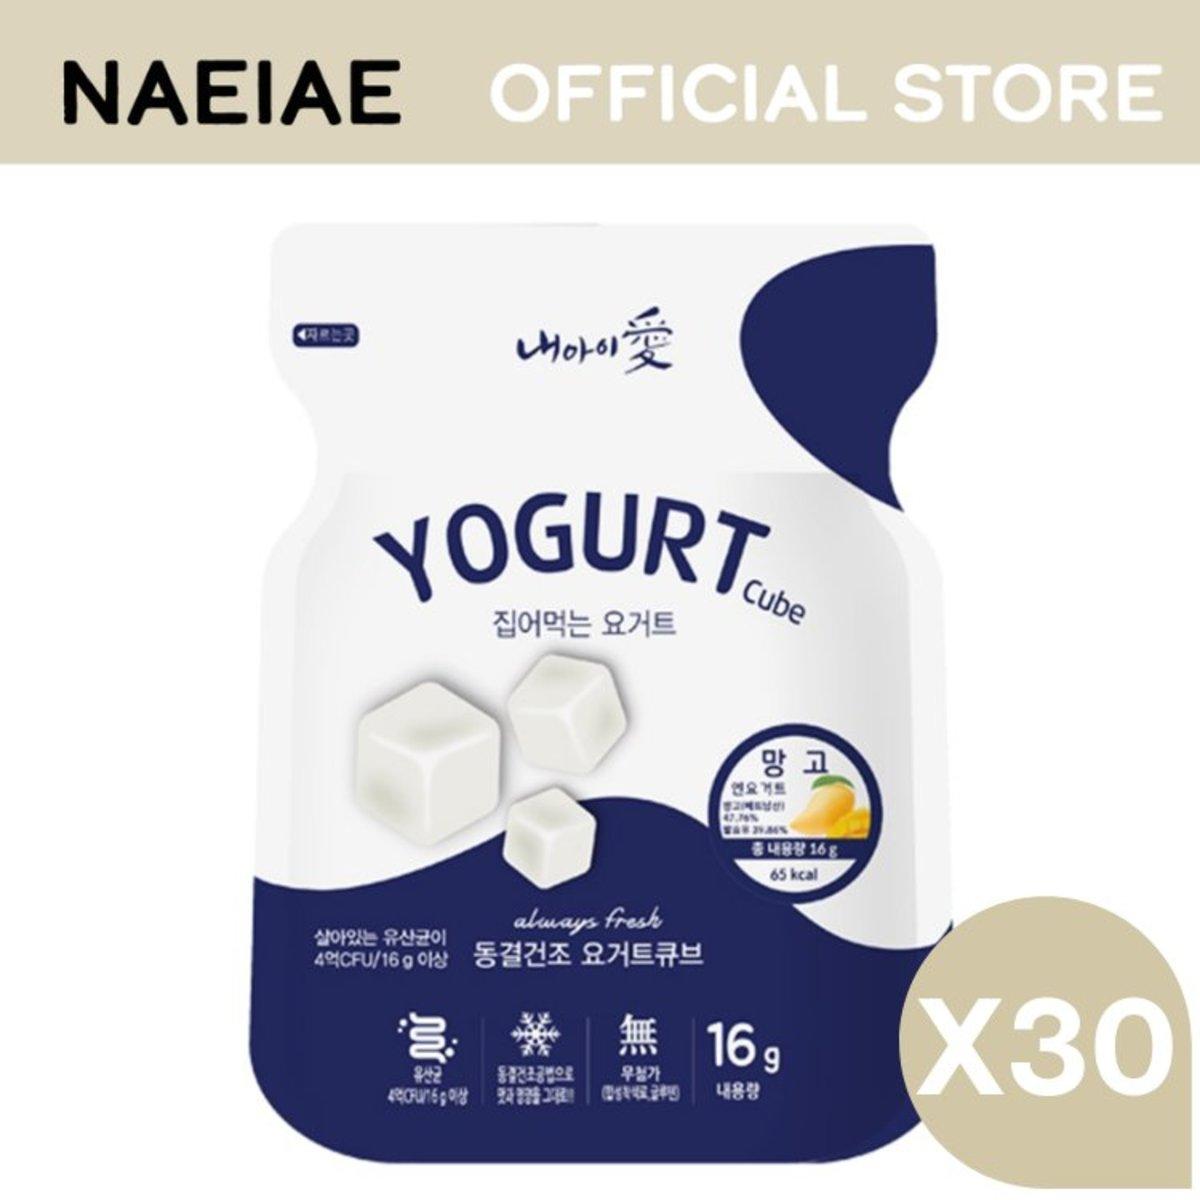 Yogurt cube - Mango X 1CTN(30packs)